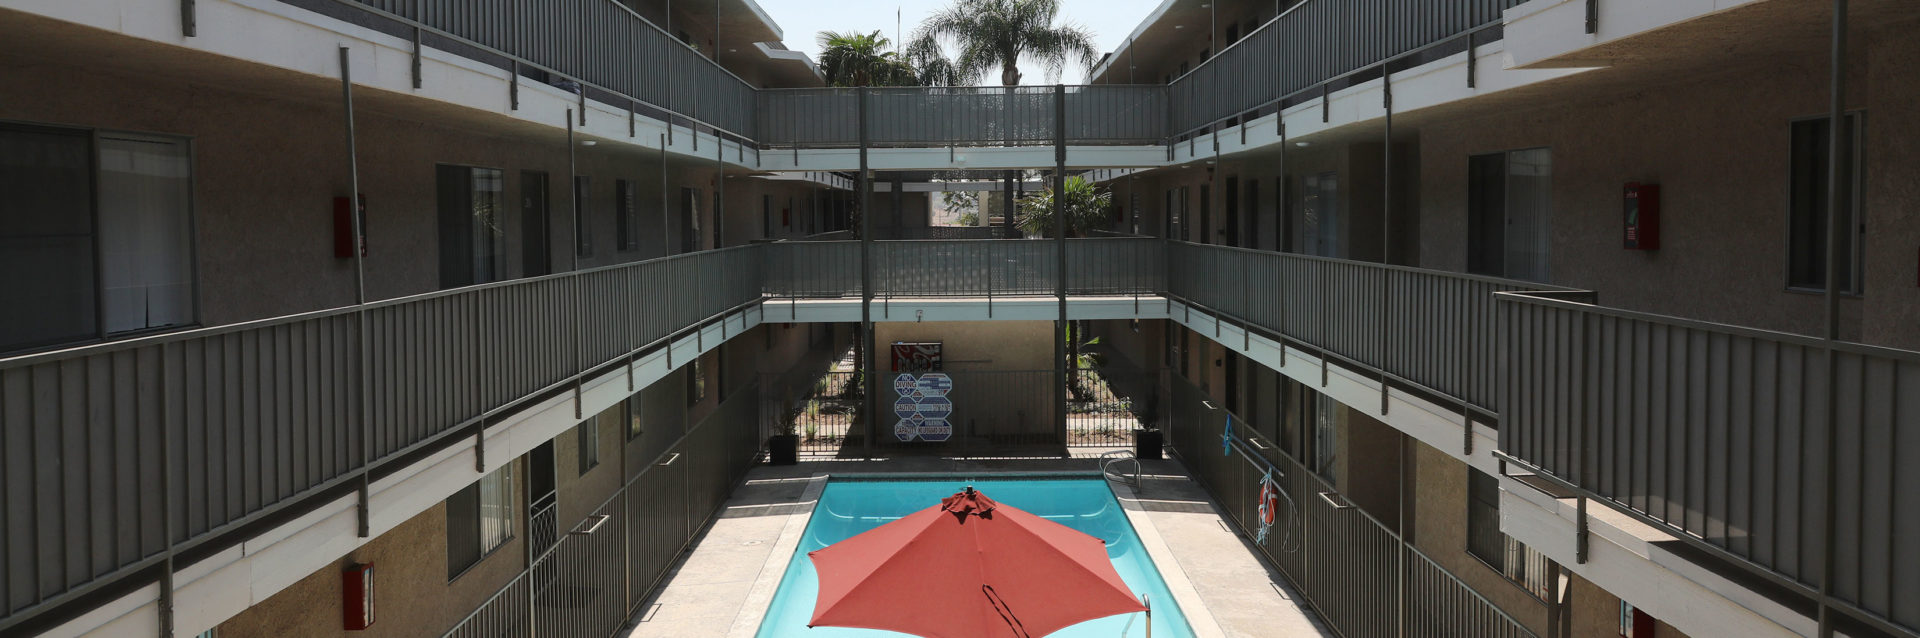 Pool area of Kendall Brook Apartments San Bernardino, CA